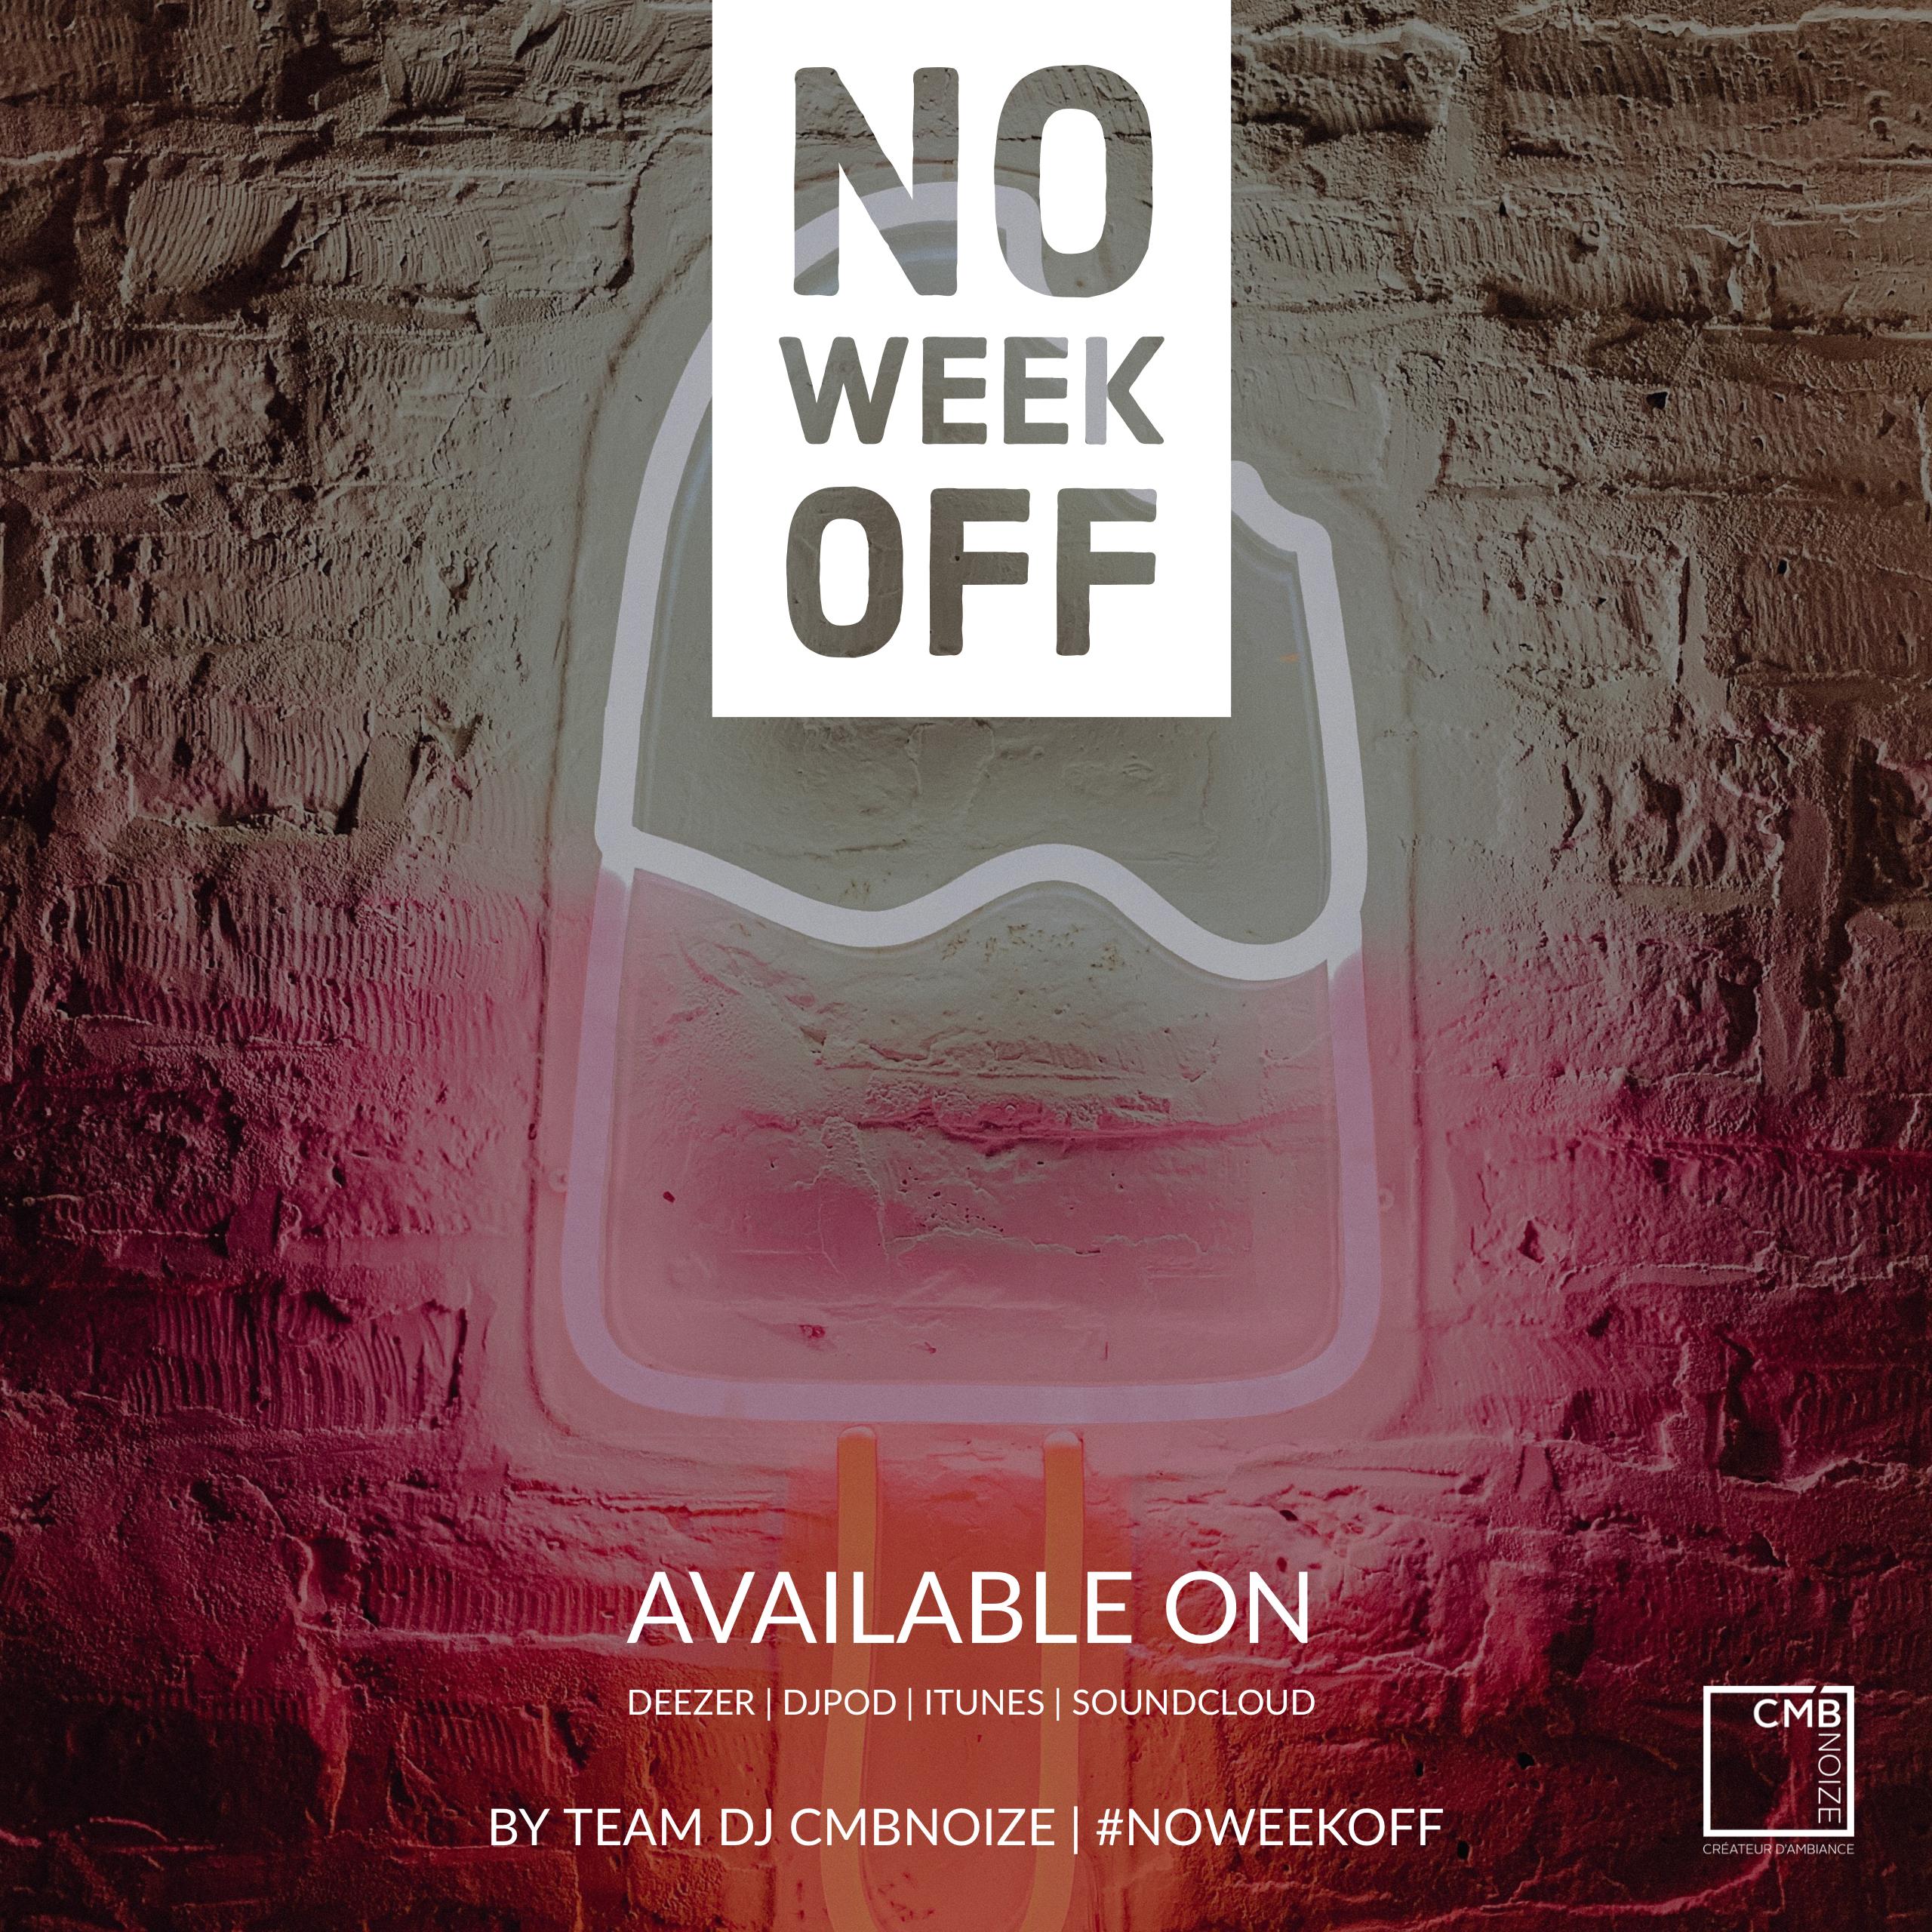 NO WEEK OFF - TEAM DJ CMBNOIZE